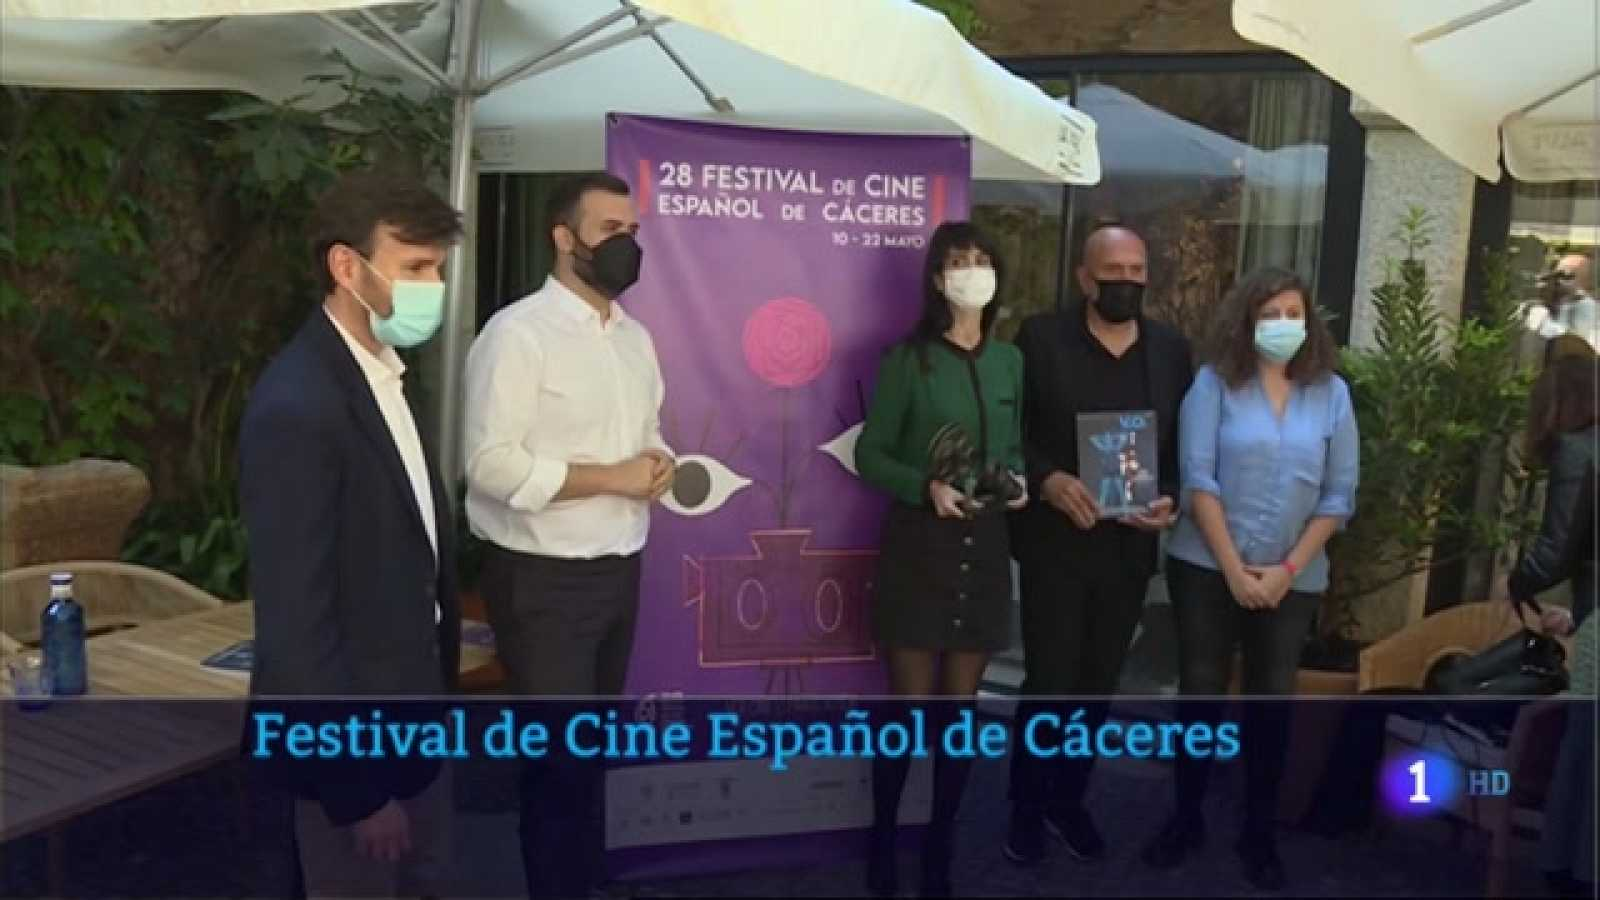 Vuelve el Festival de Cine Español de Cáceres - 05/05/2021